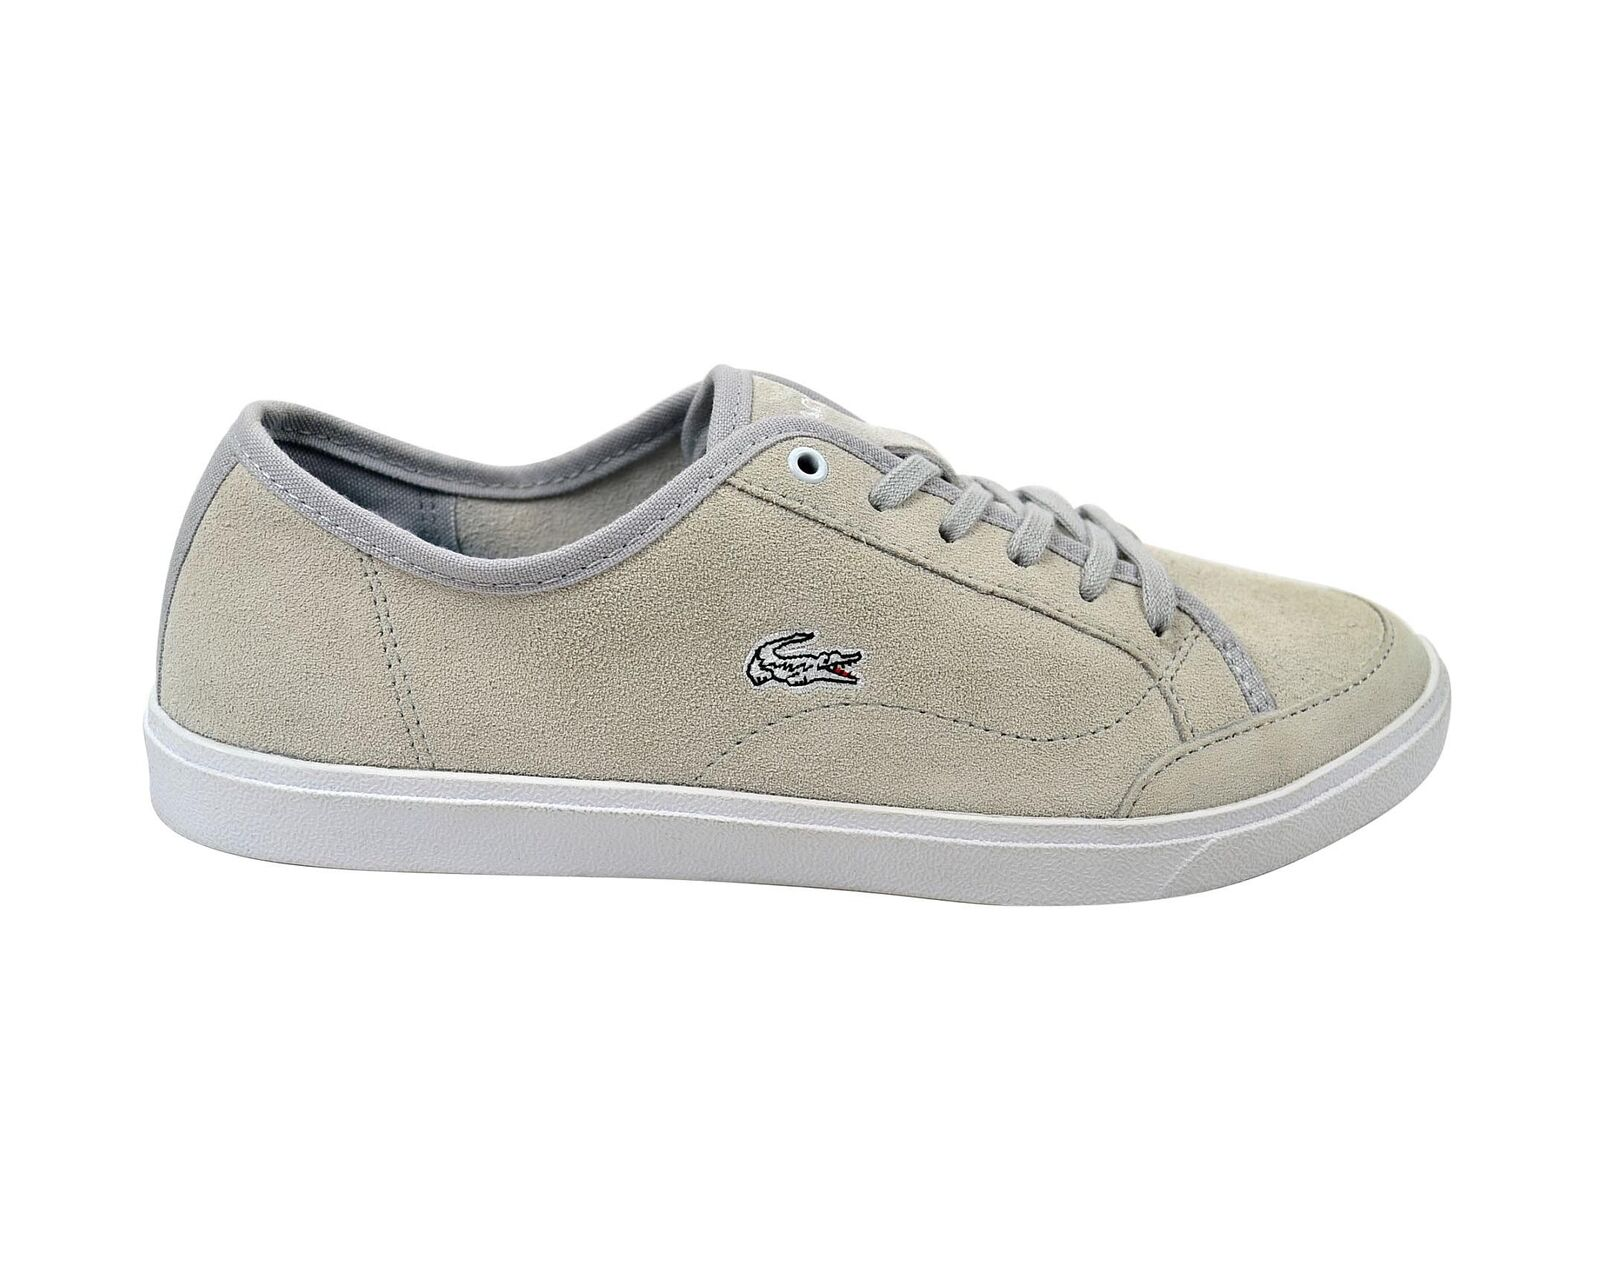 Lacoste Polidor Jaw SPW light grey/light grey Schuhe/Sneaker grau Größenauswahl!